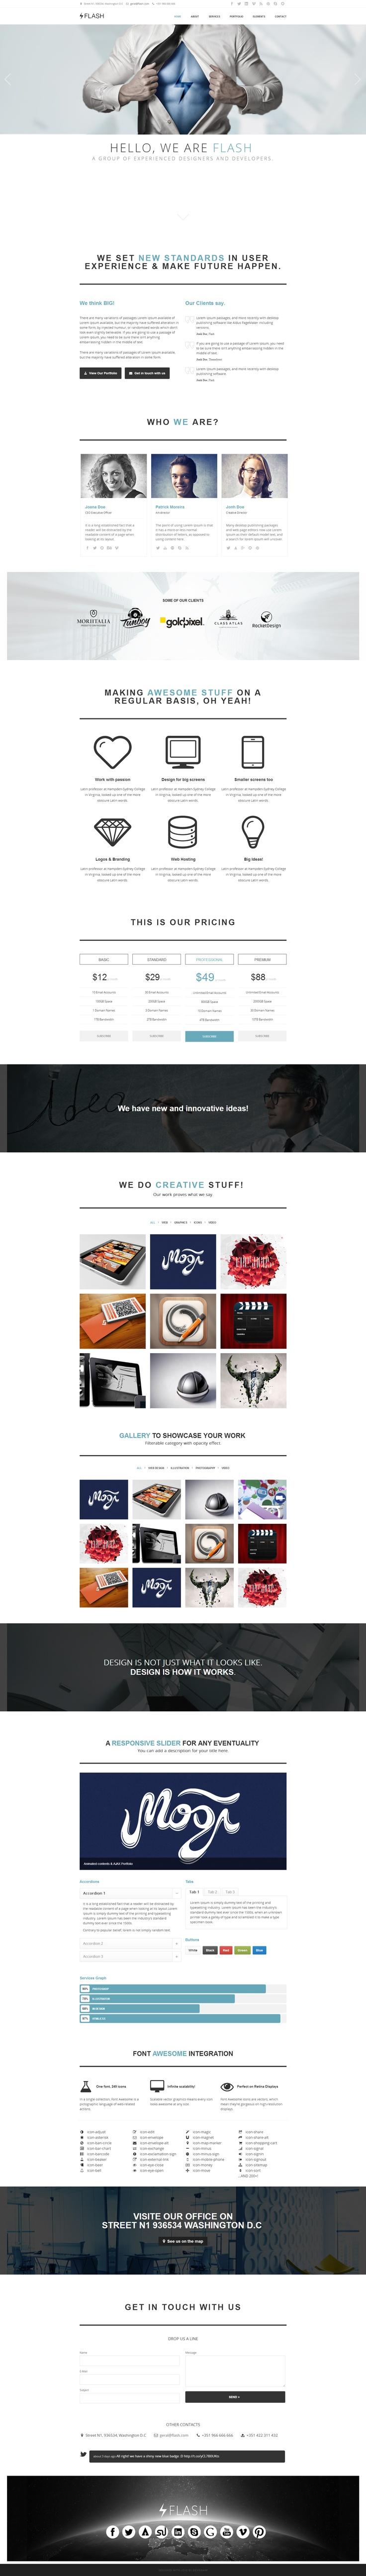 Flash - Retina Ready #Responsive Parallax #Template - #webdesign #theme #creative $14